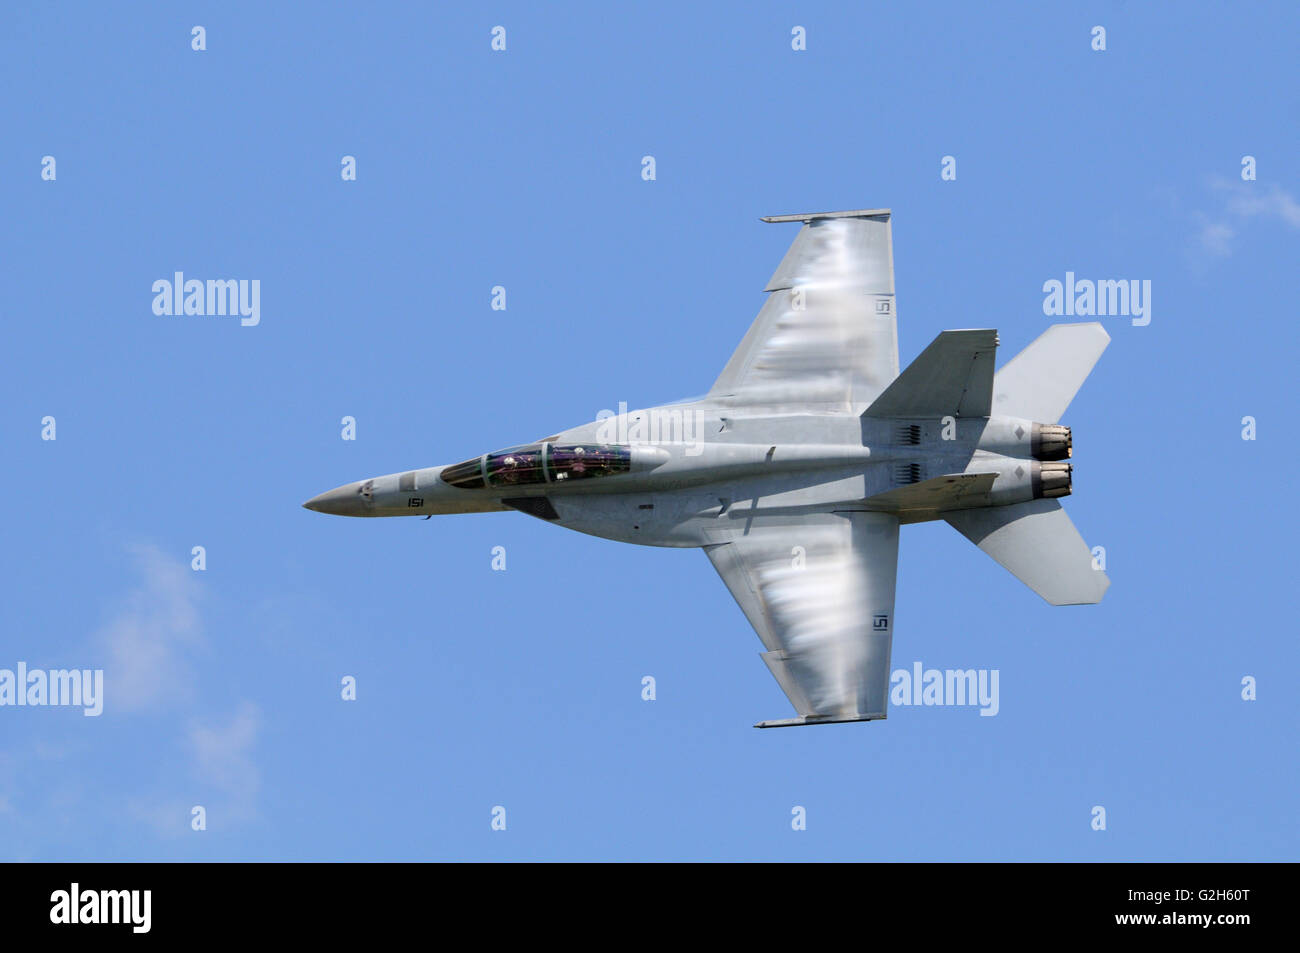 A U.S.A.  Navy F/A-18E/F Super Hornet performs at an airshow in Missouri USA Stock Photo